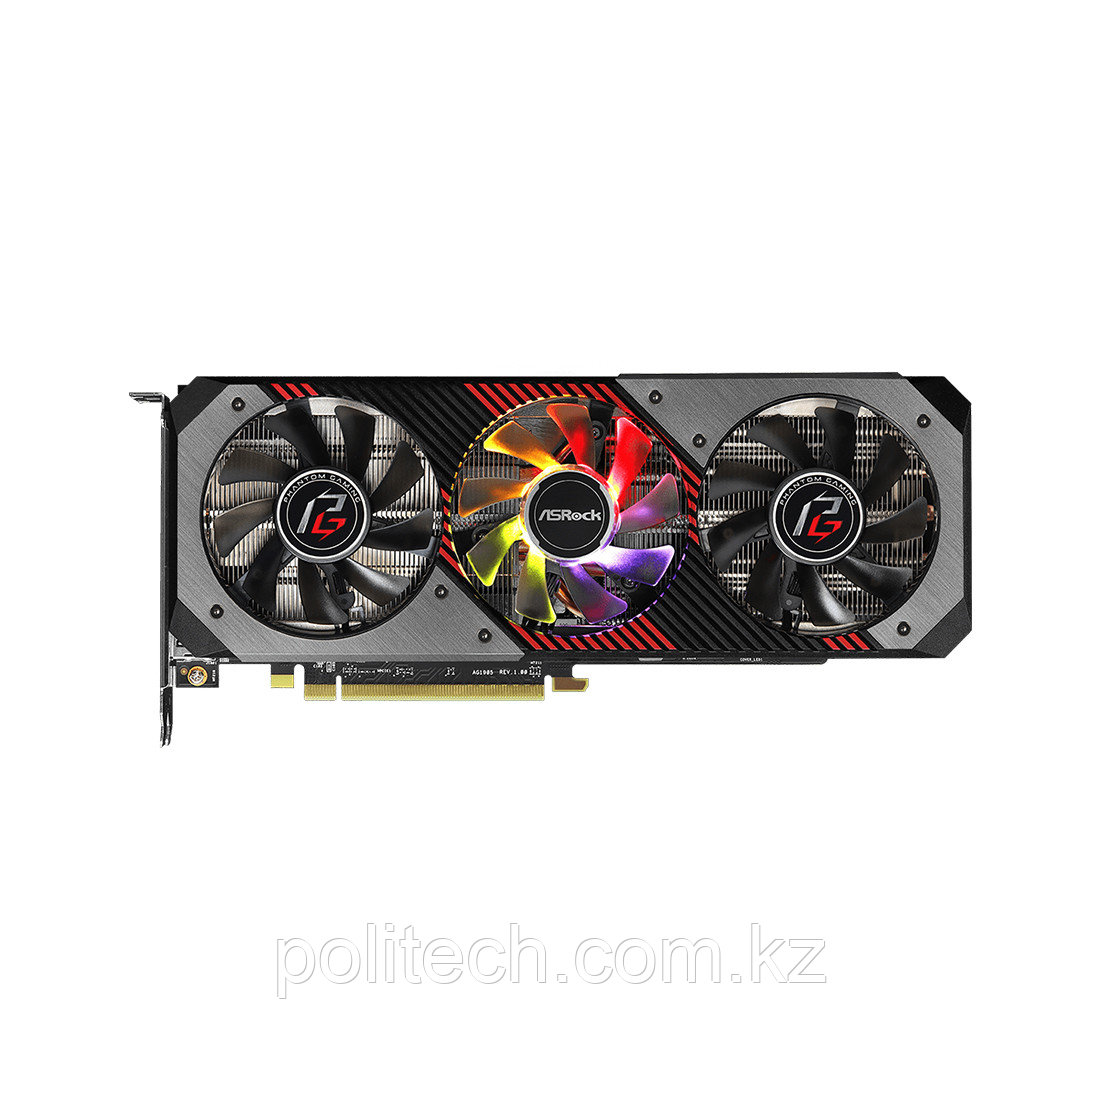 Видеокарта ASRock Radeon RX5700XT PGD 8GO